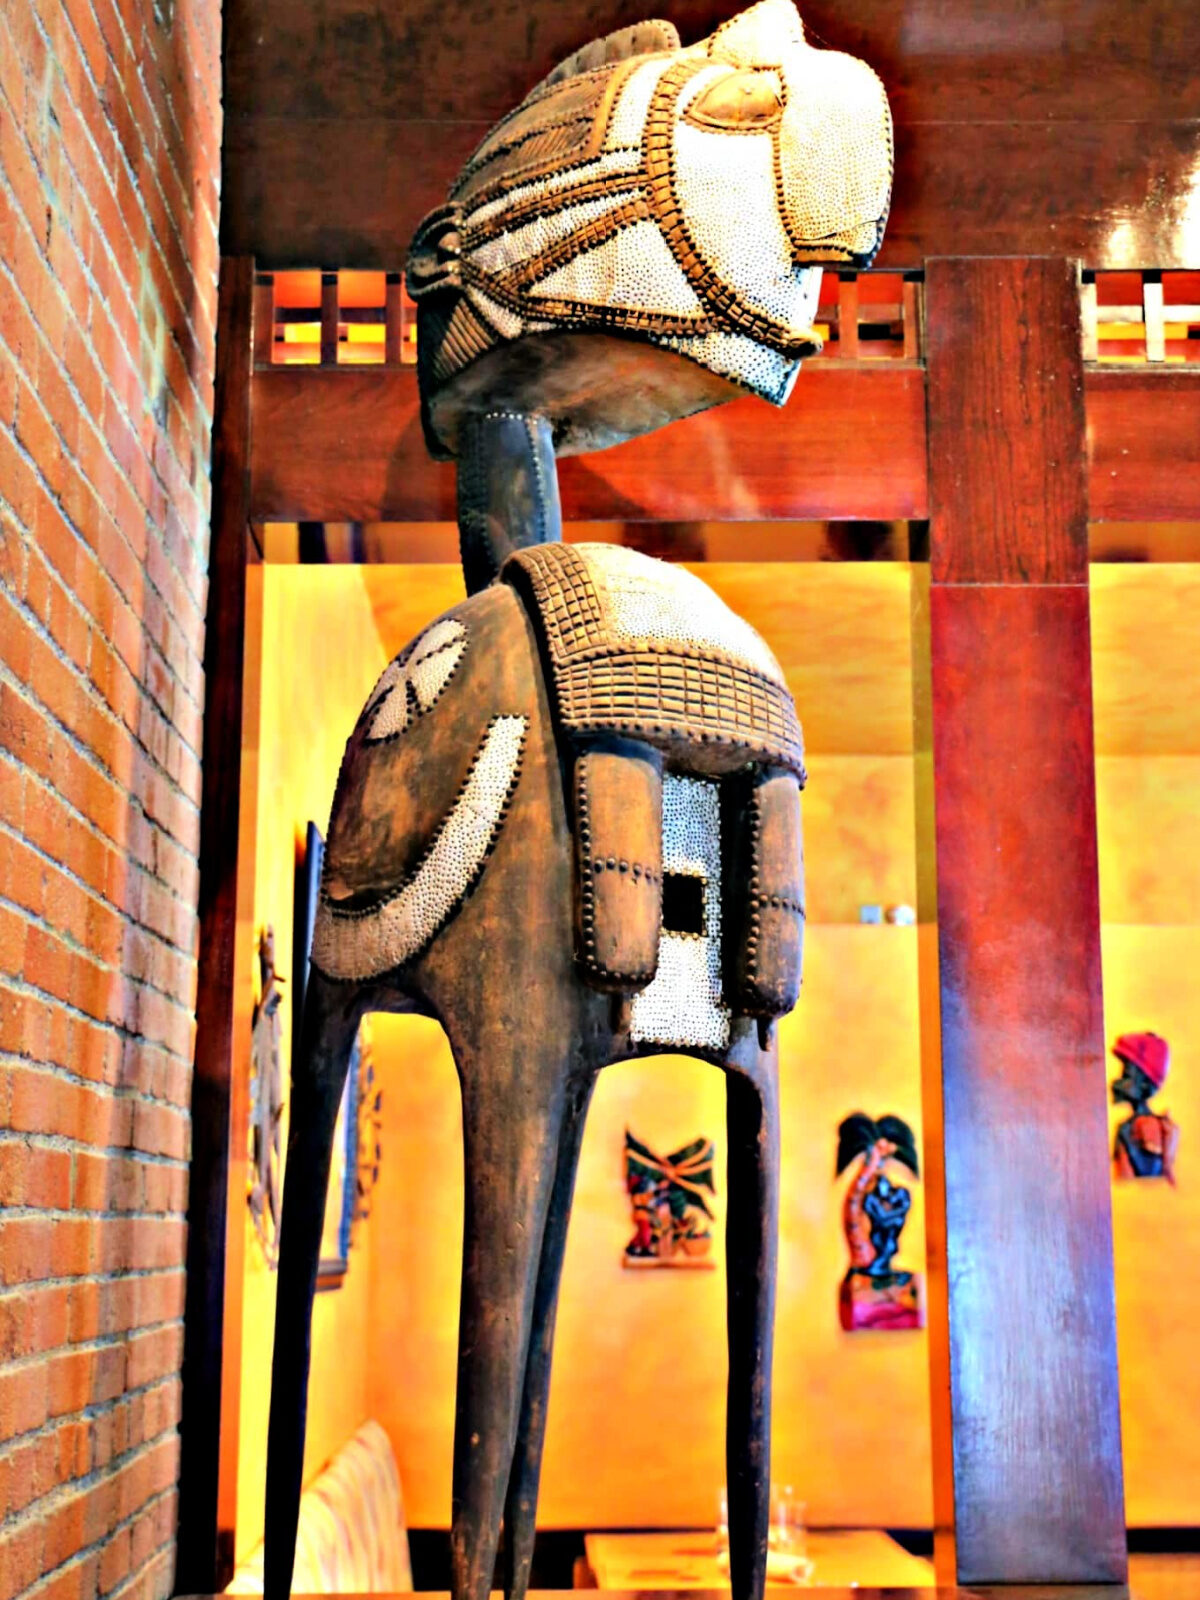 Latin sculpture with four legs inside a restaurant.